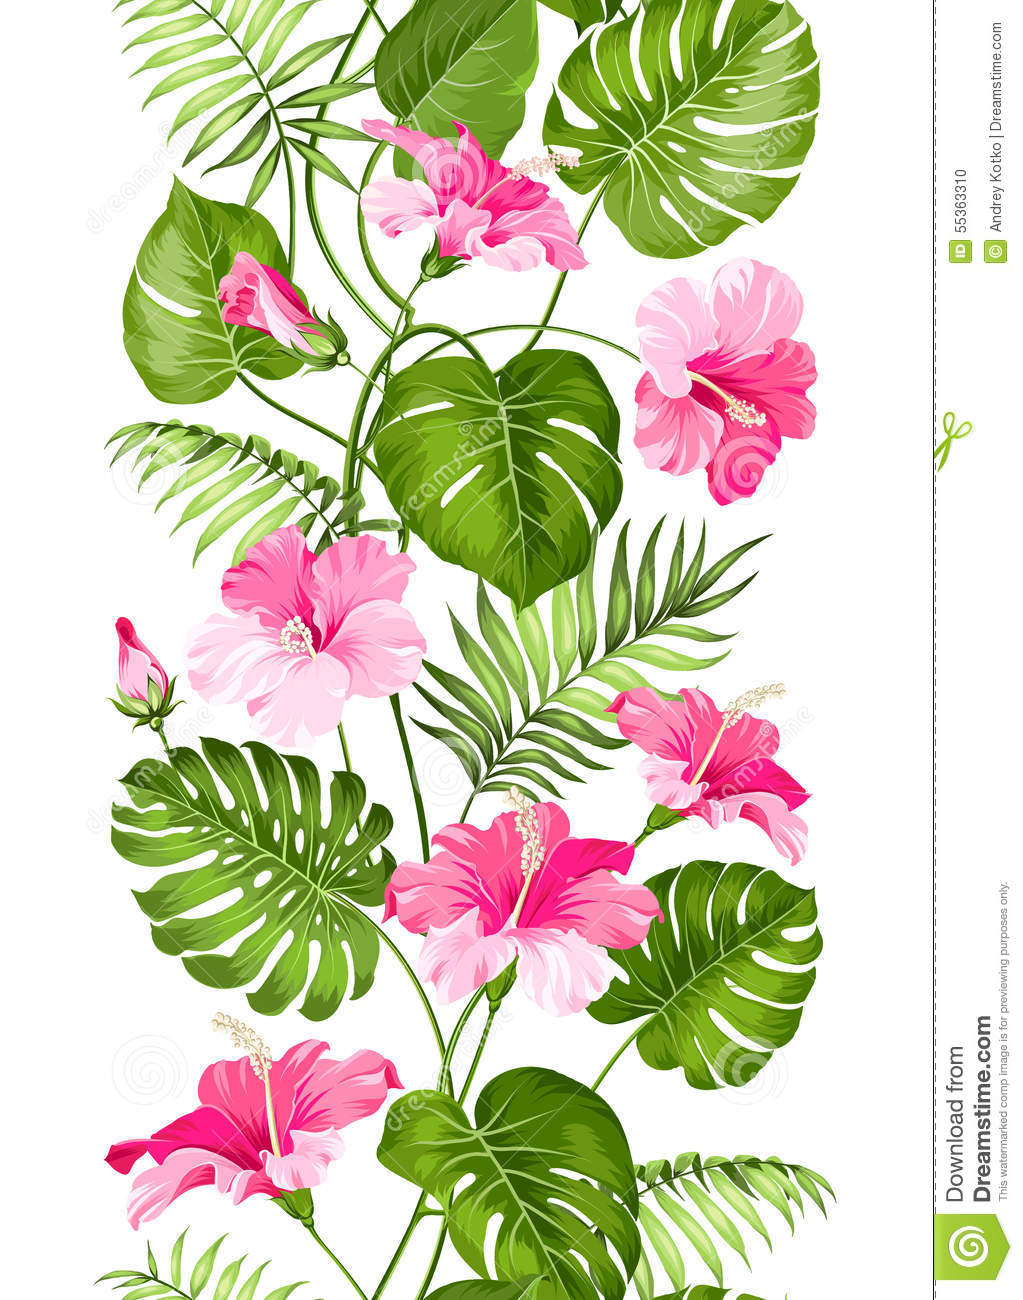 Linear Floral Designs